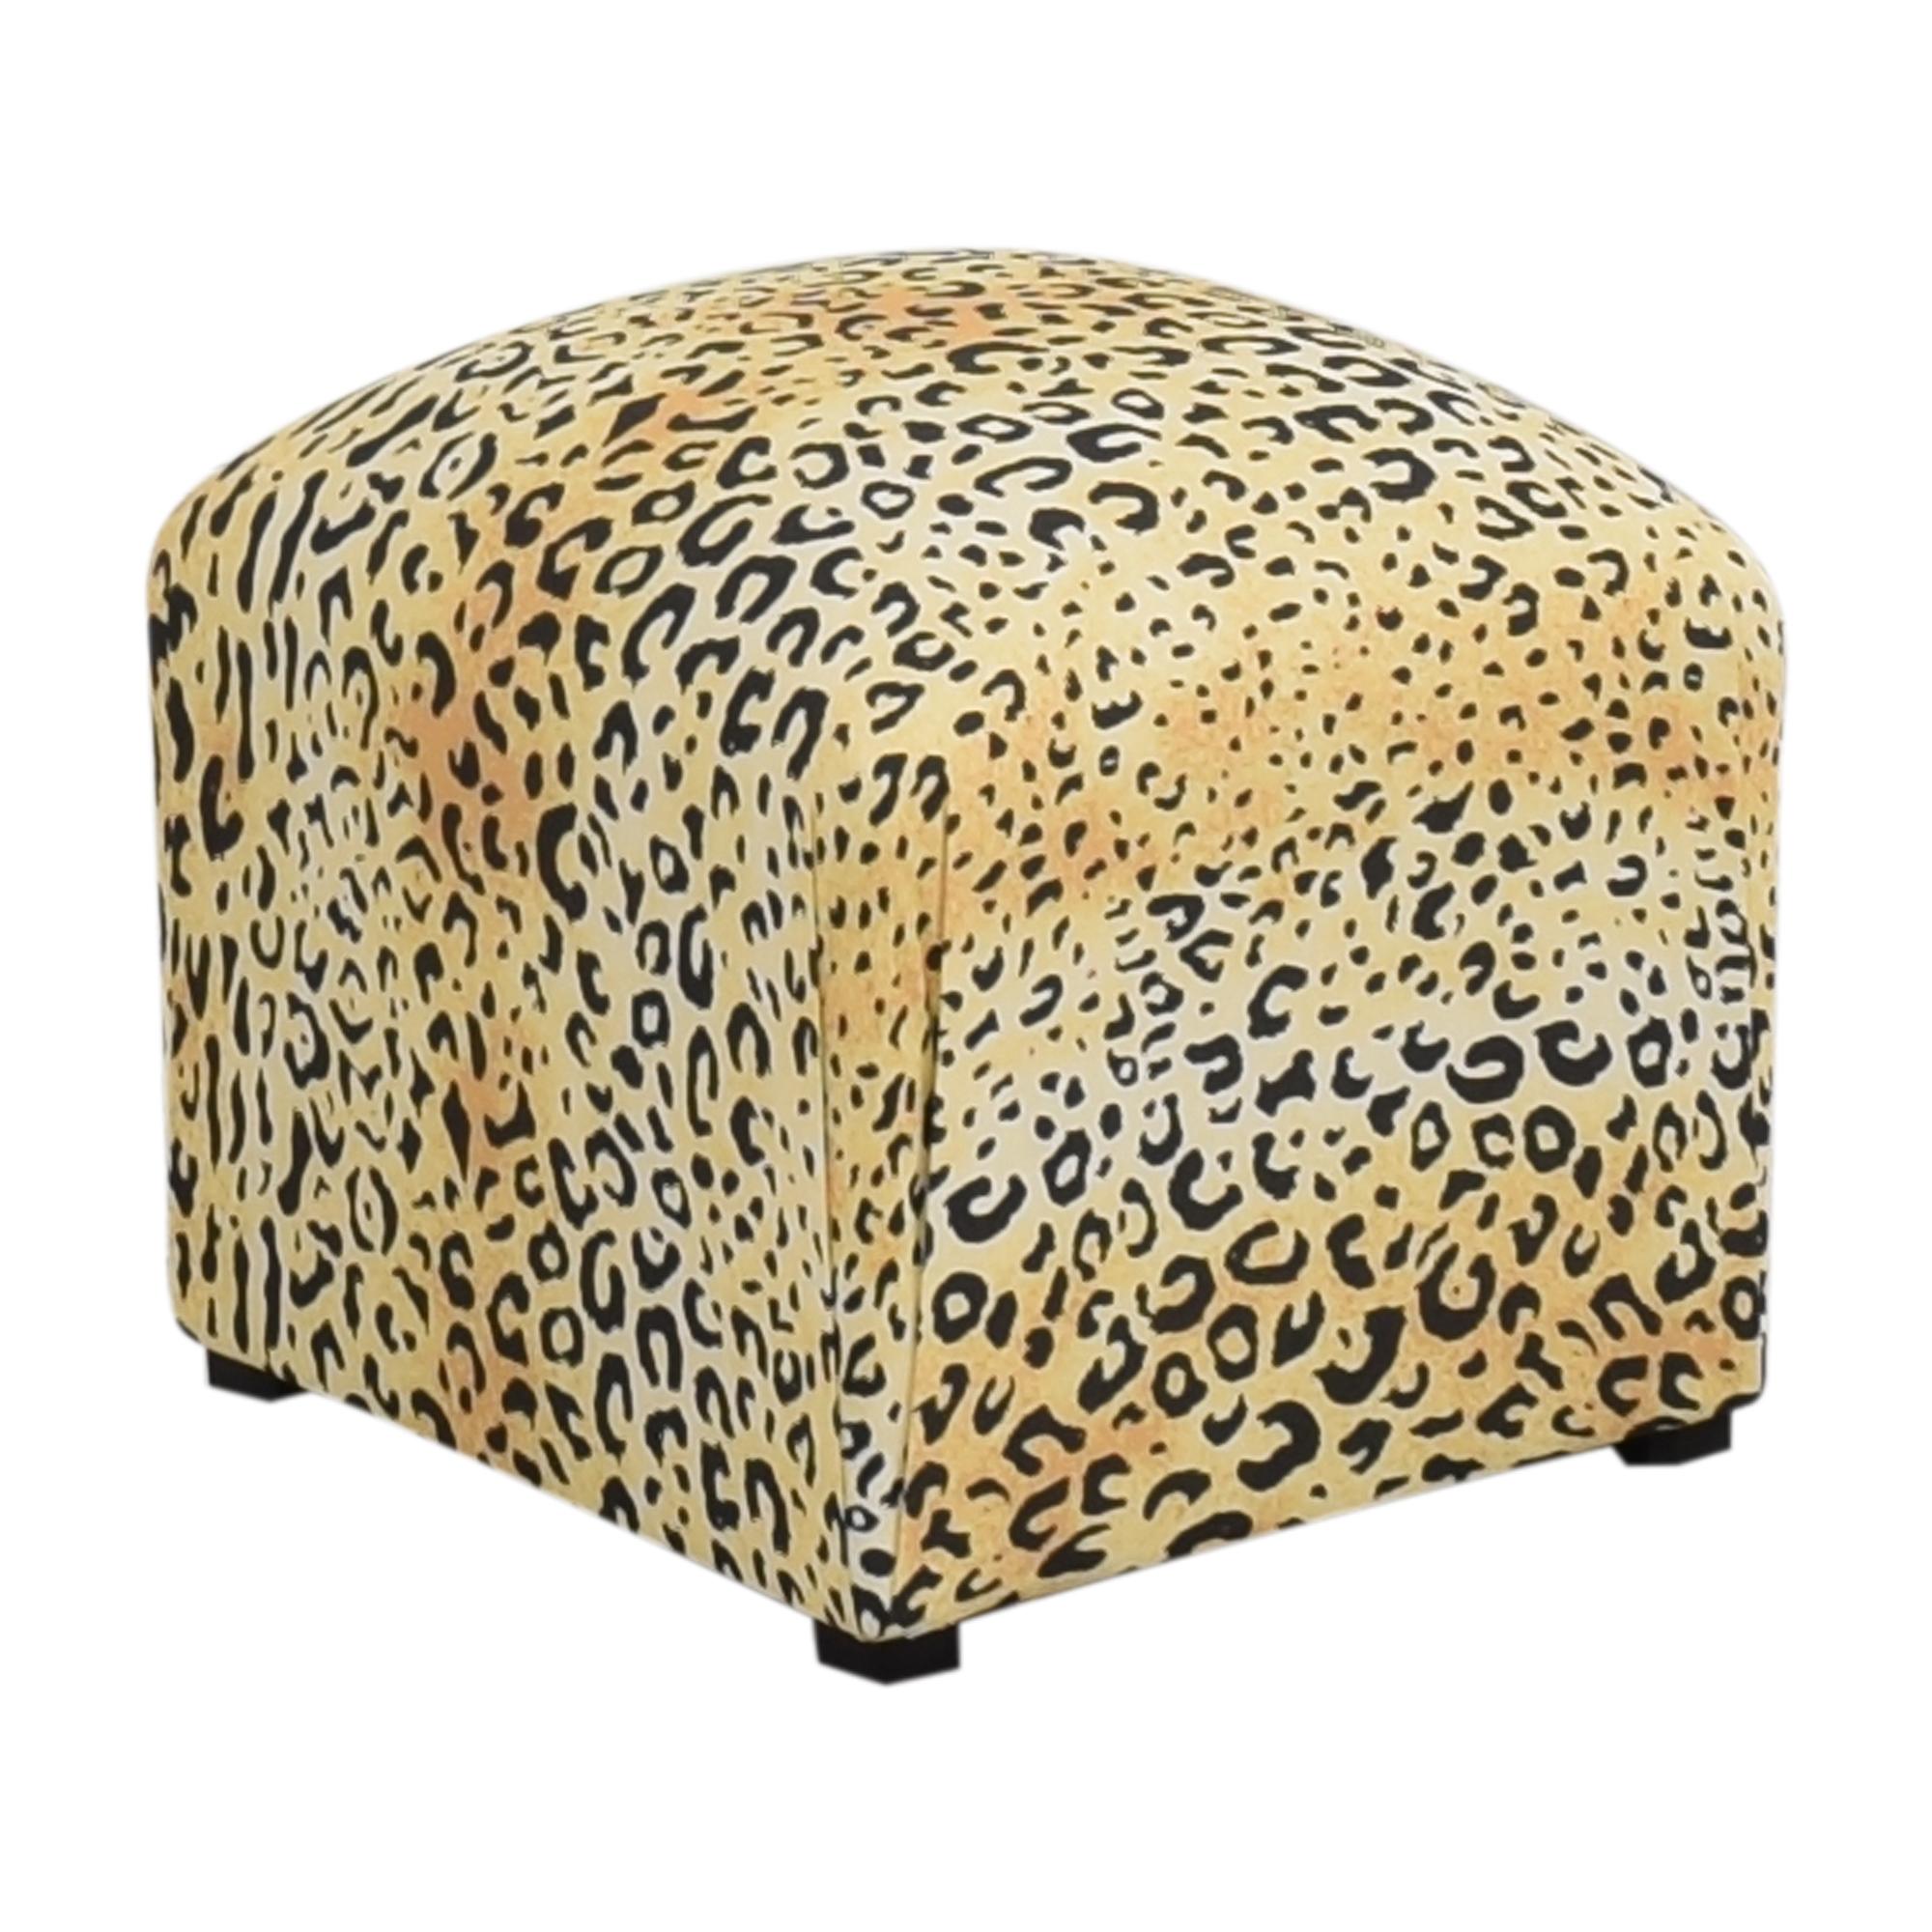 buy The Inside Leopard Deco Ottoman The Inside